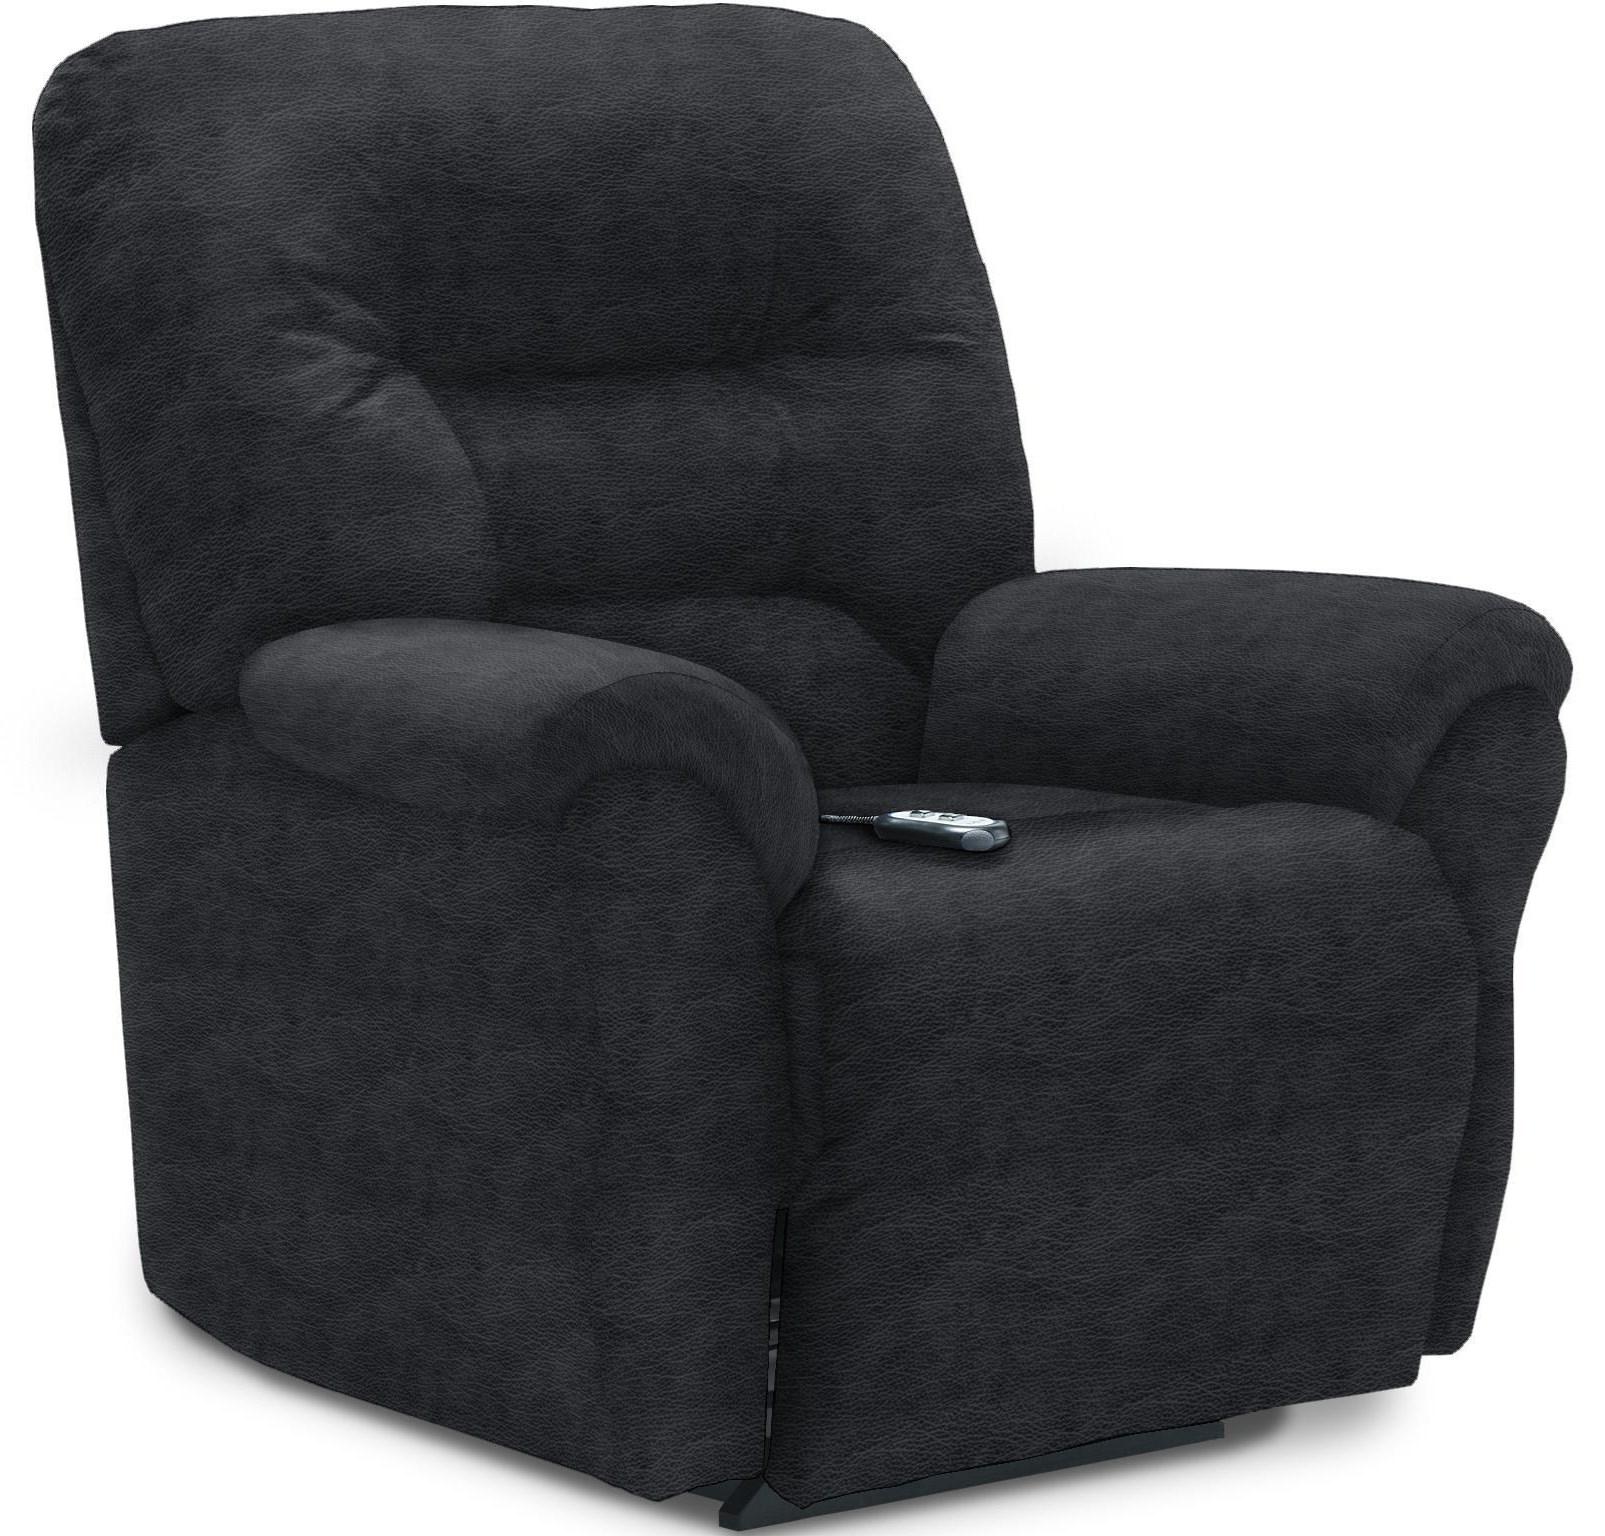 7N37LU Rocker Recliner by Best Home Furnishings at Furniture Fair - North Carolina